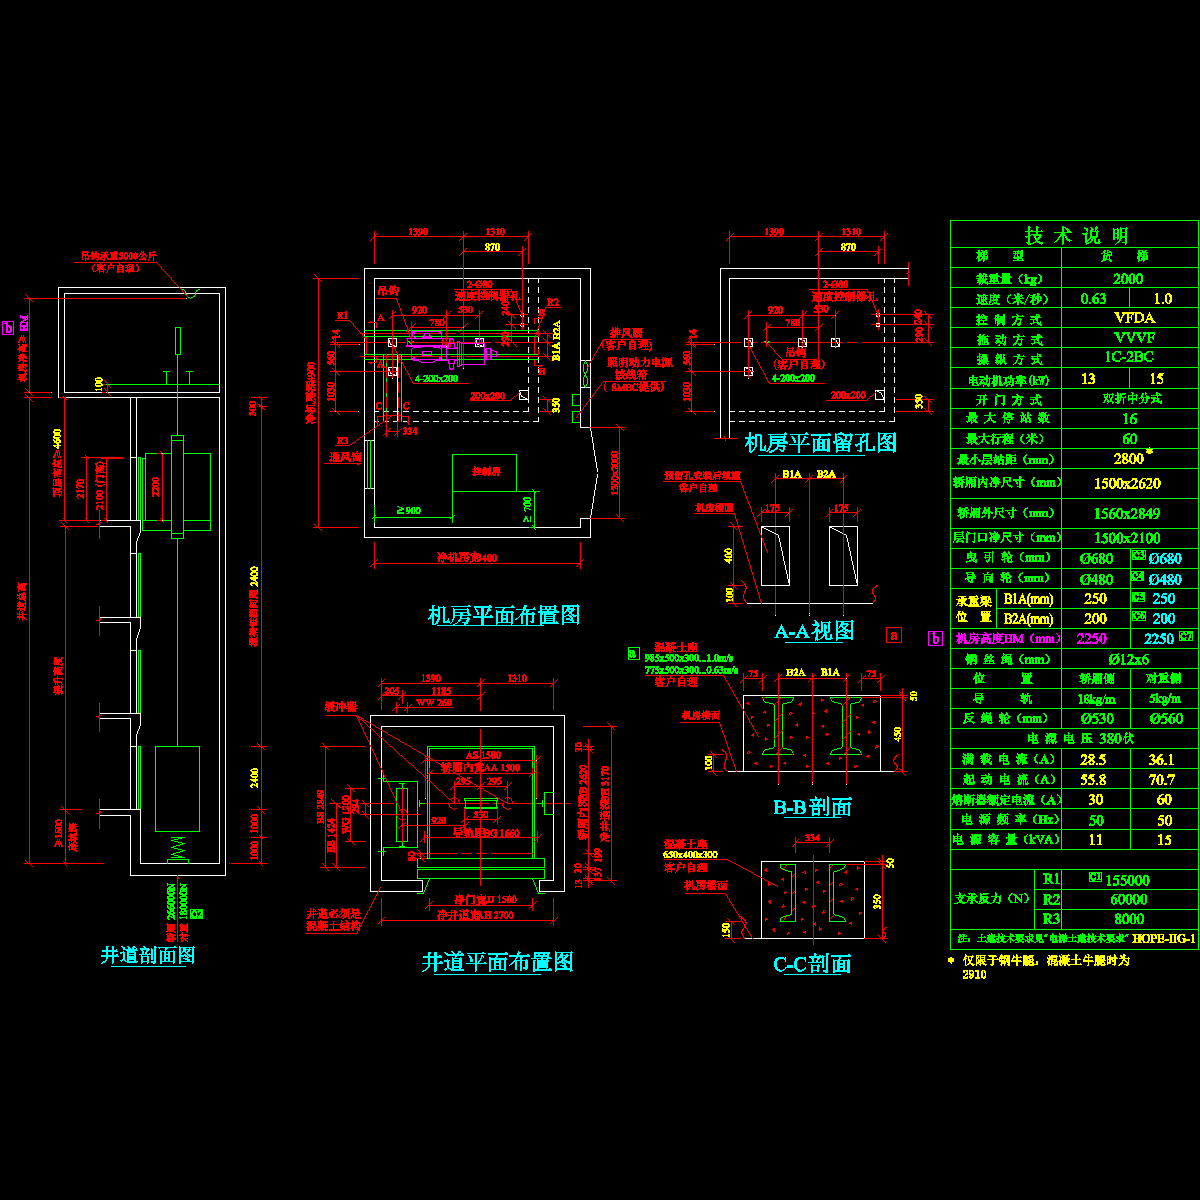 006-2t货梯单开门1米速度.dwg